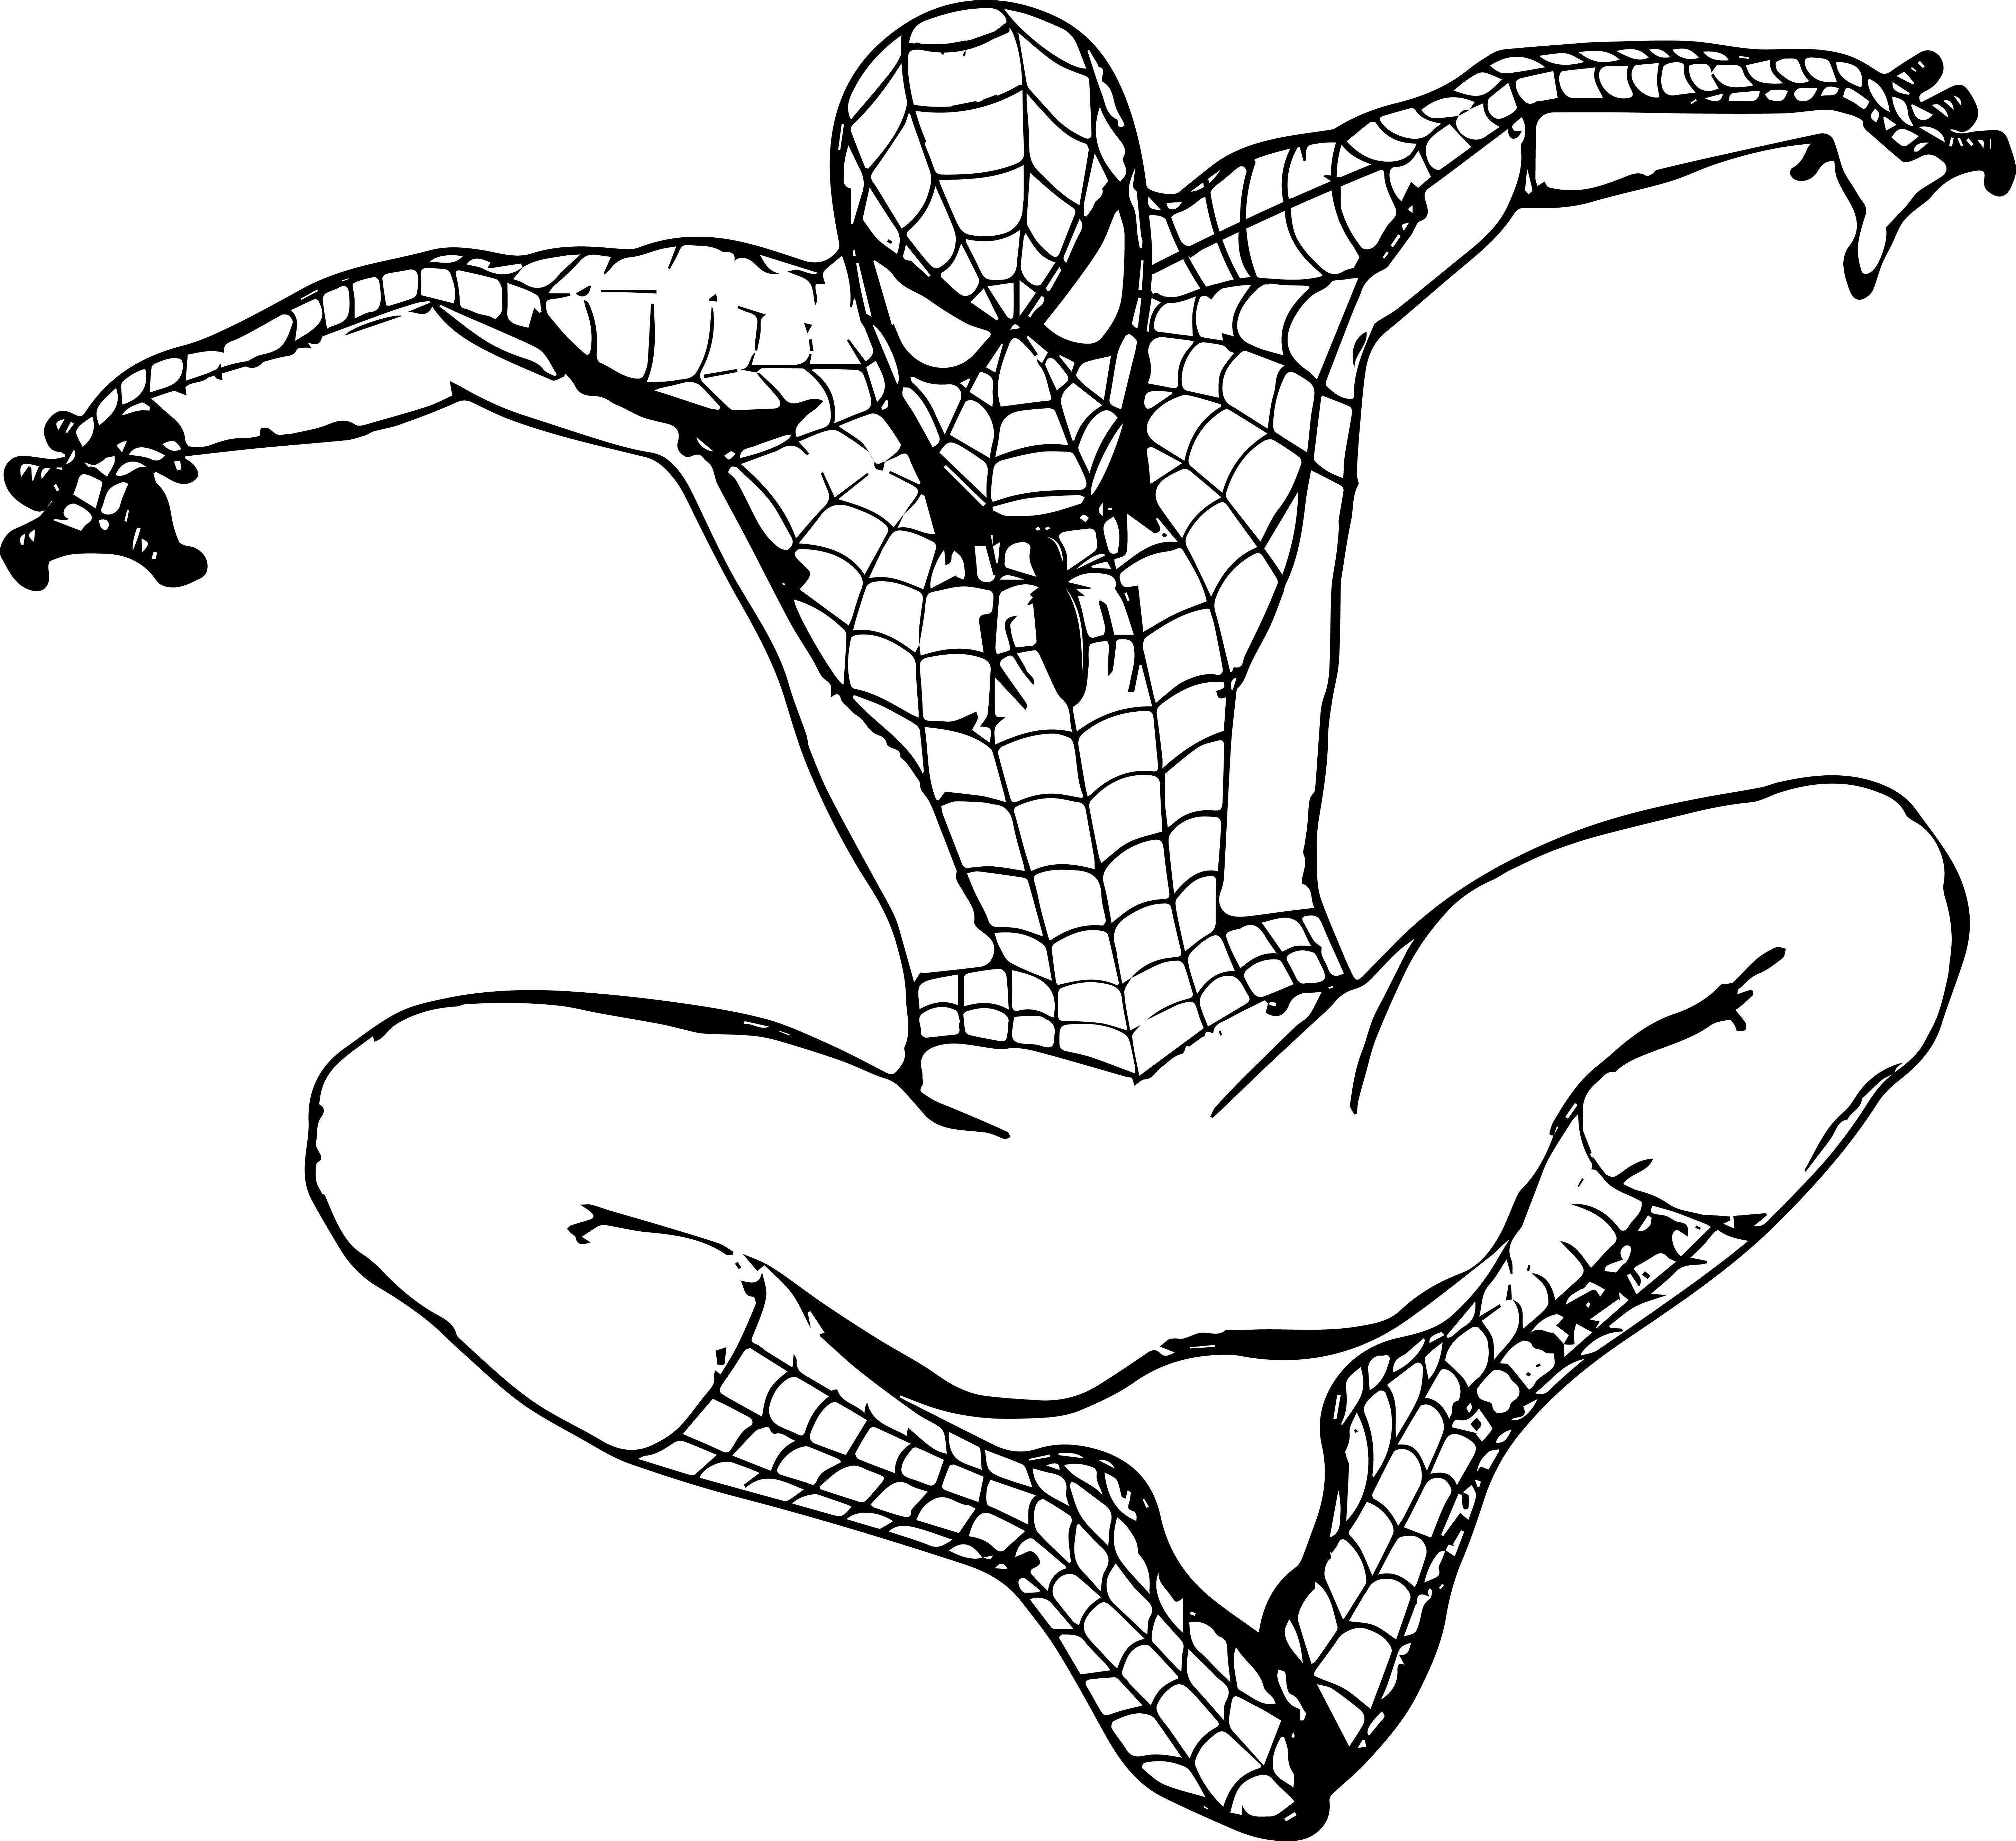 Spiderman Cartoon Drawing At Getdrawings Com Free For Personal Use Spiderman Cartoon Drawing Superhero Coloring Pages Superhero Coloring Spiderman Coloring